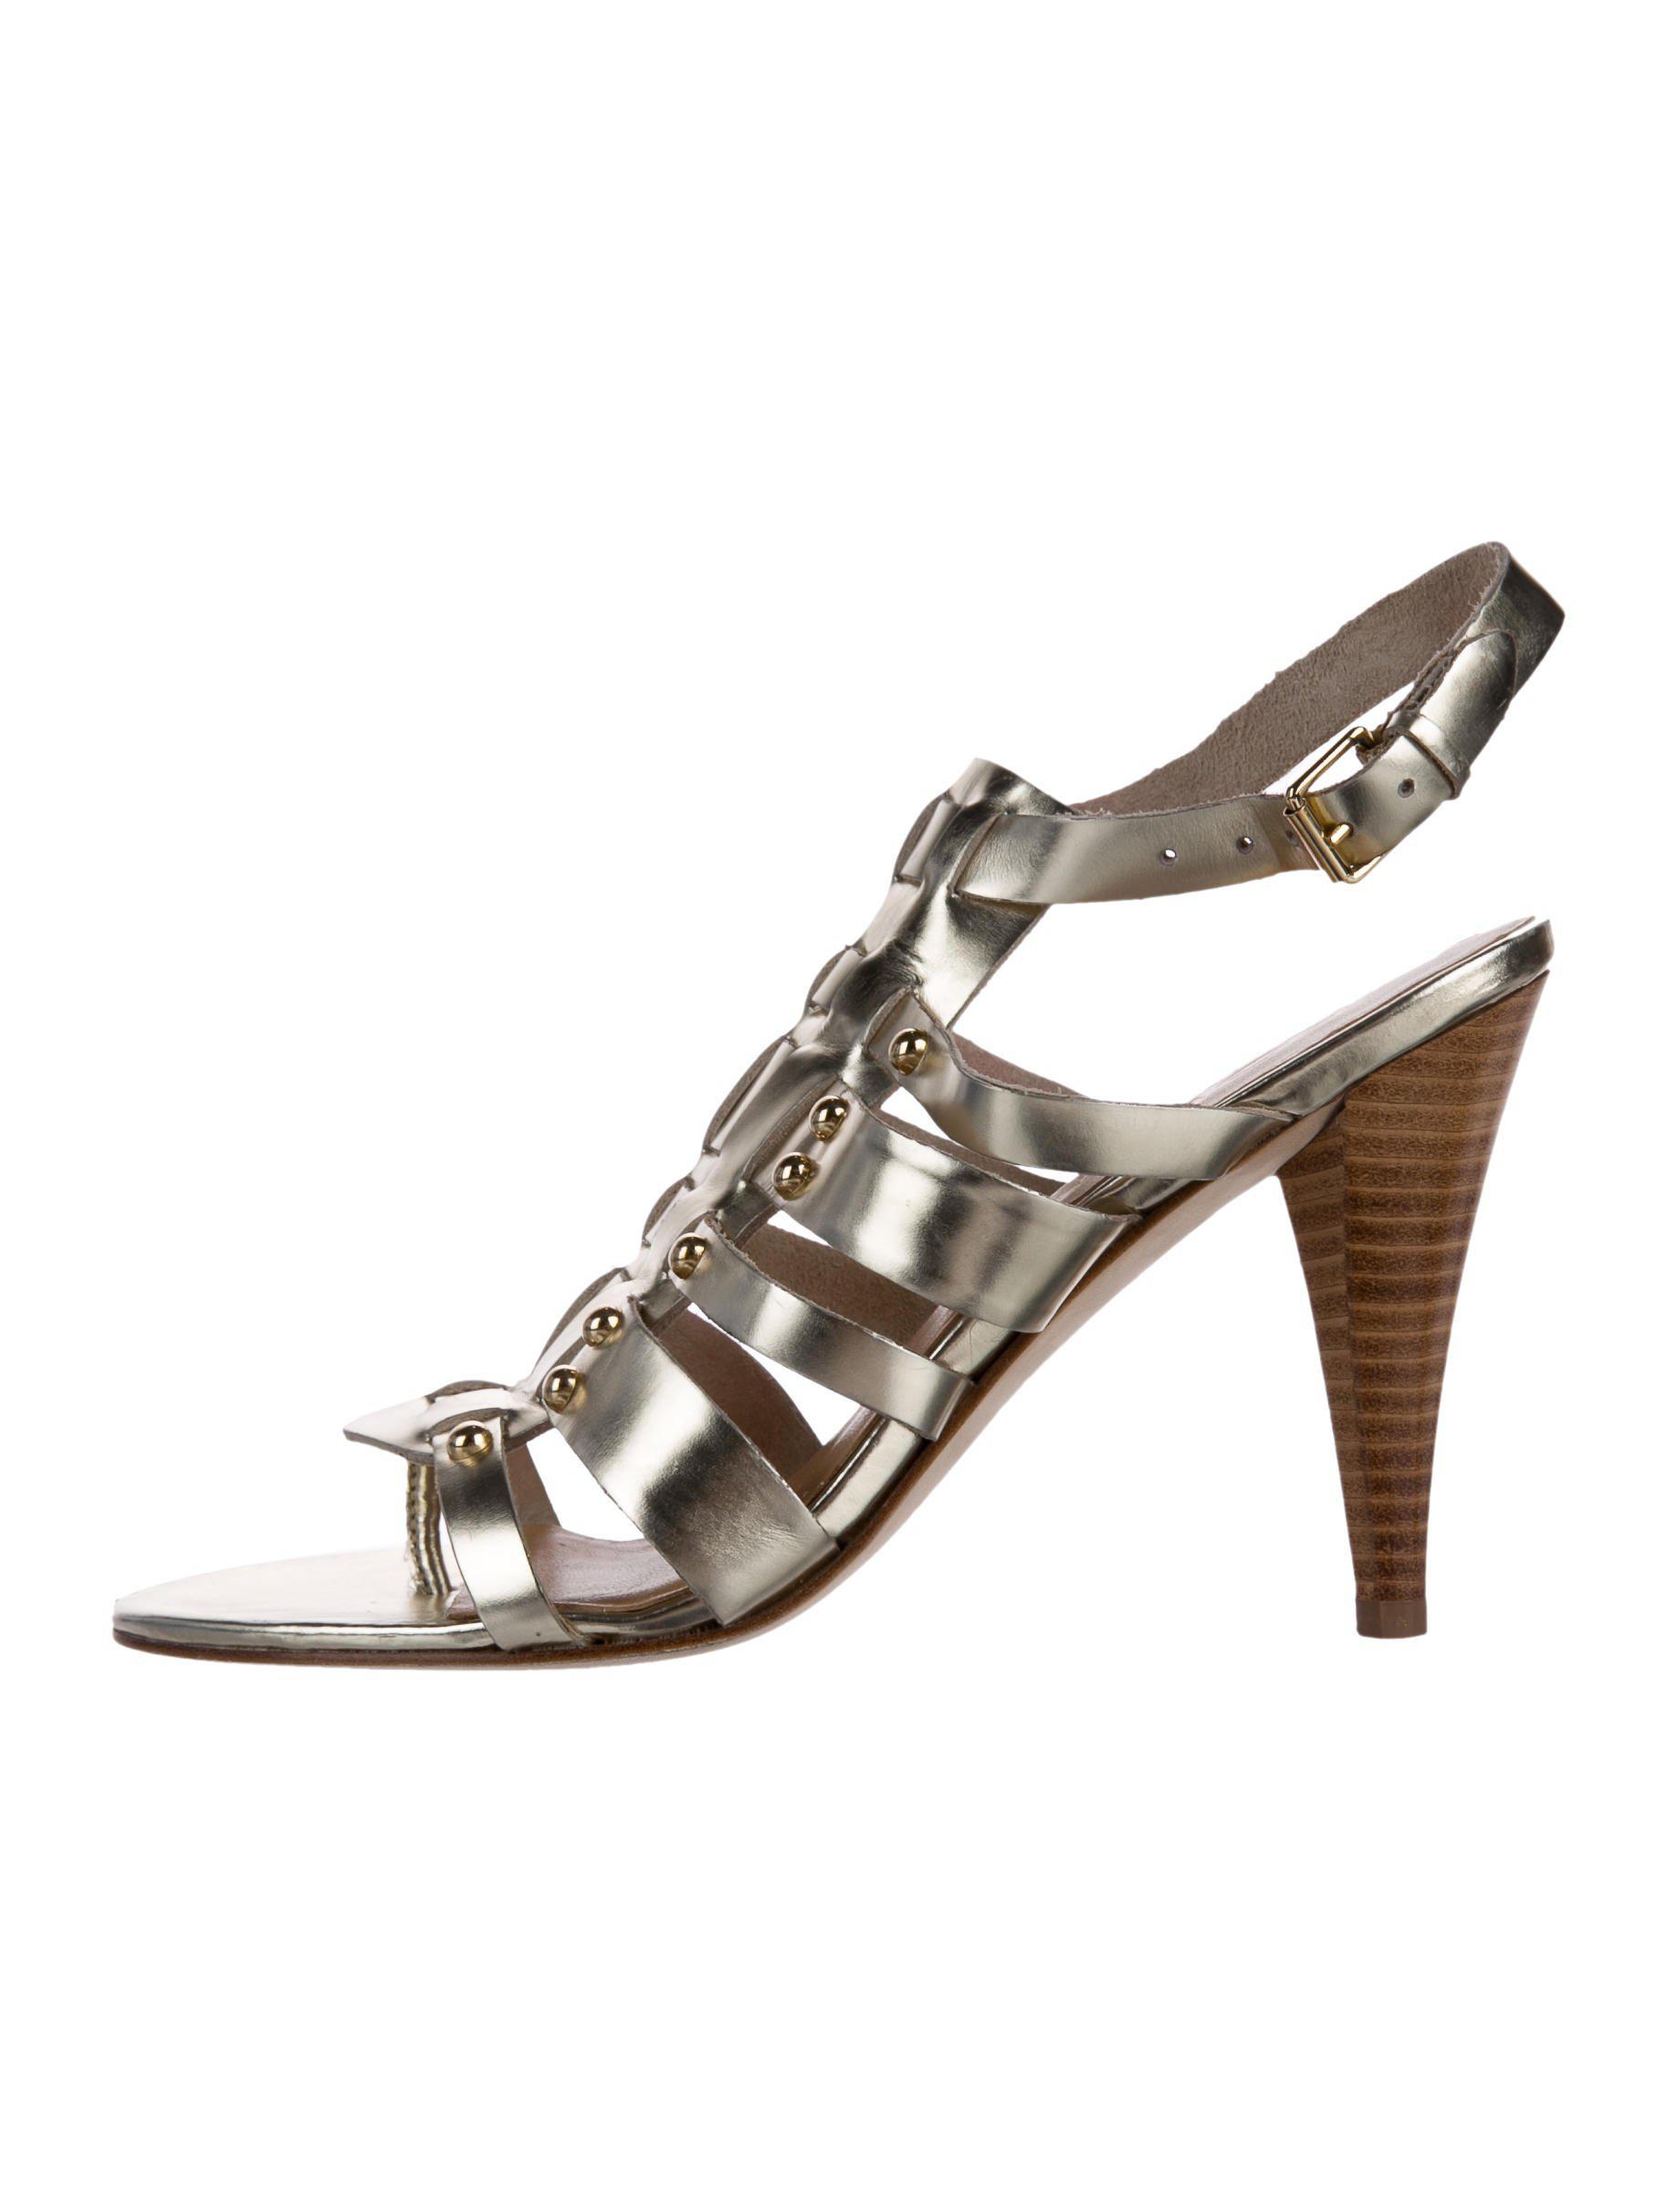 0d6ee4a456a4 Lyst - Michael Michael Kors Michael Kors Caged Sandals Gold in Metallic